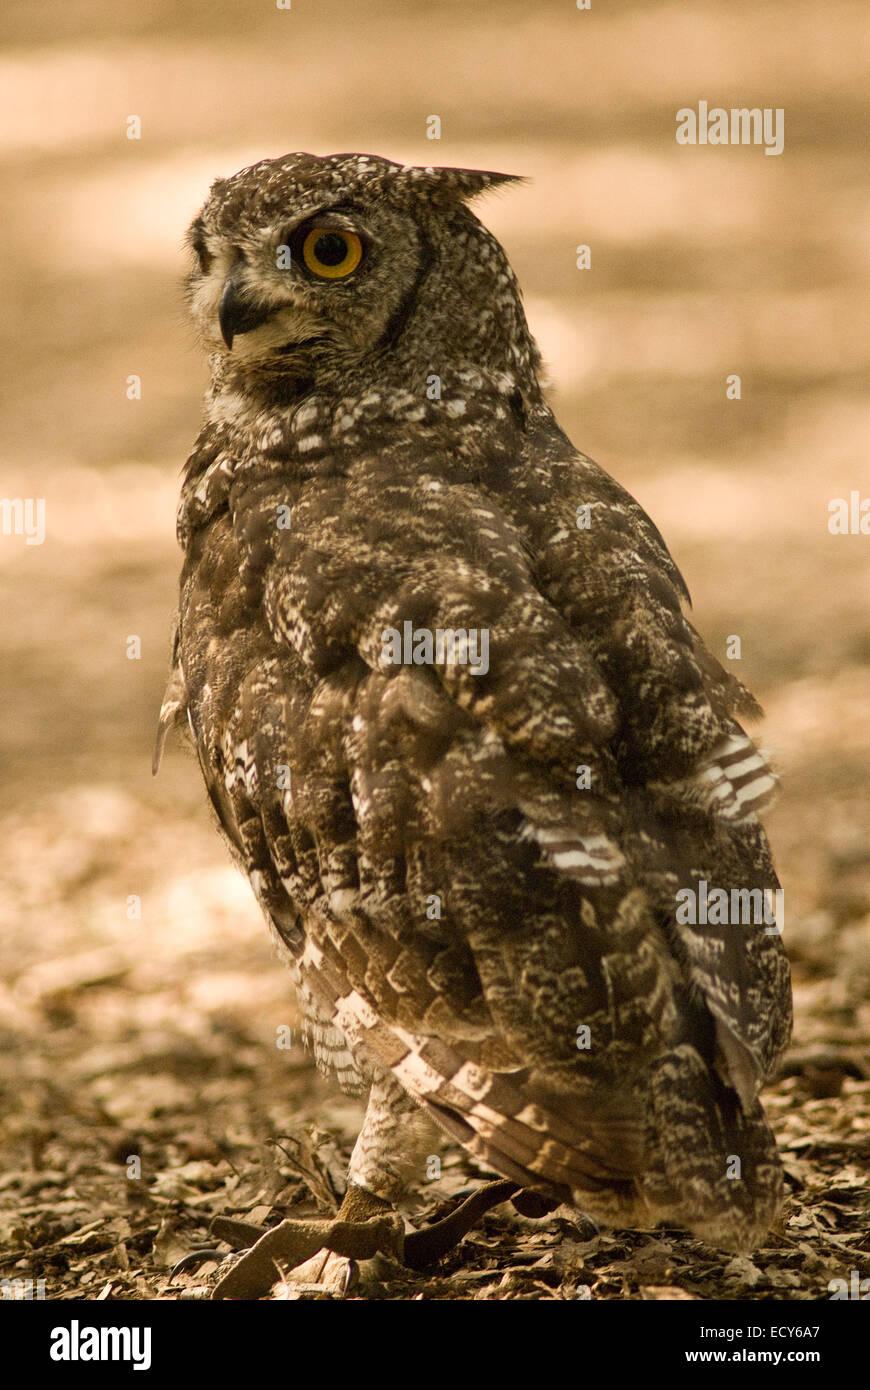 Spotted eagle-owl (Bubo africanus), Strigidae - Stock Image